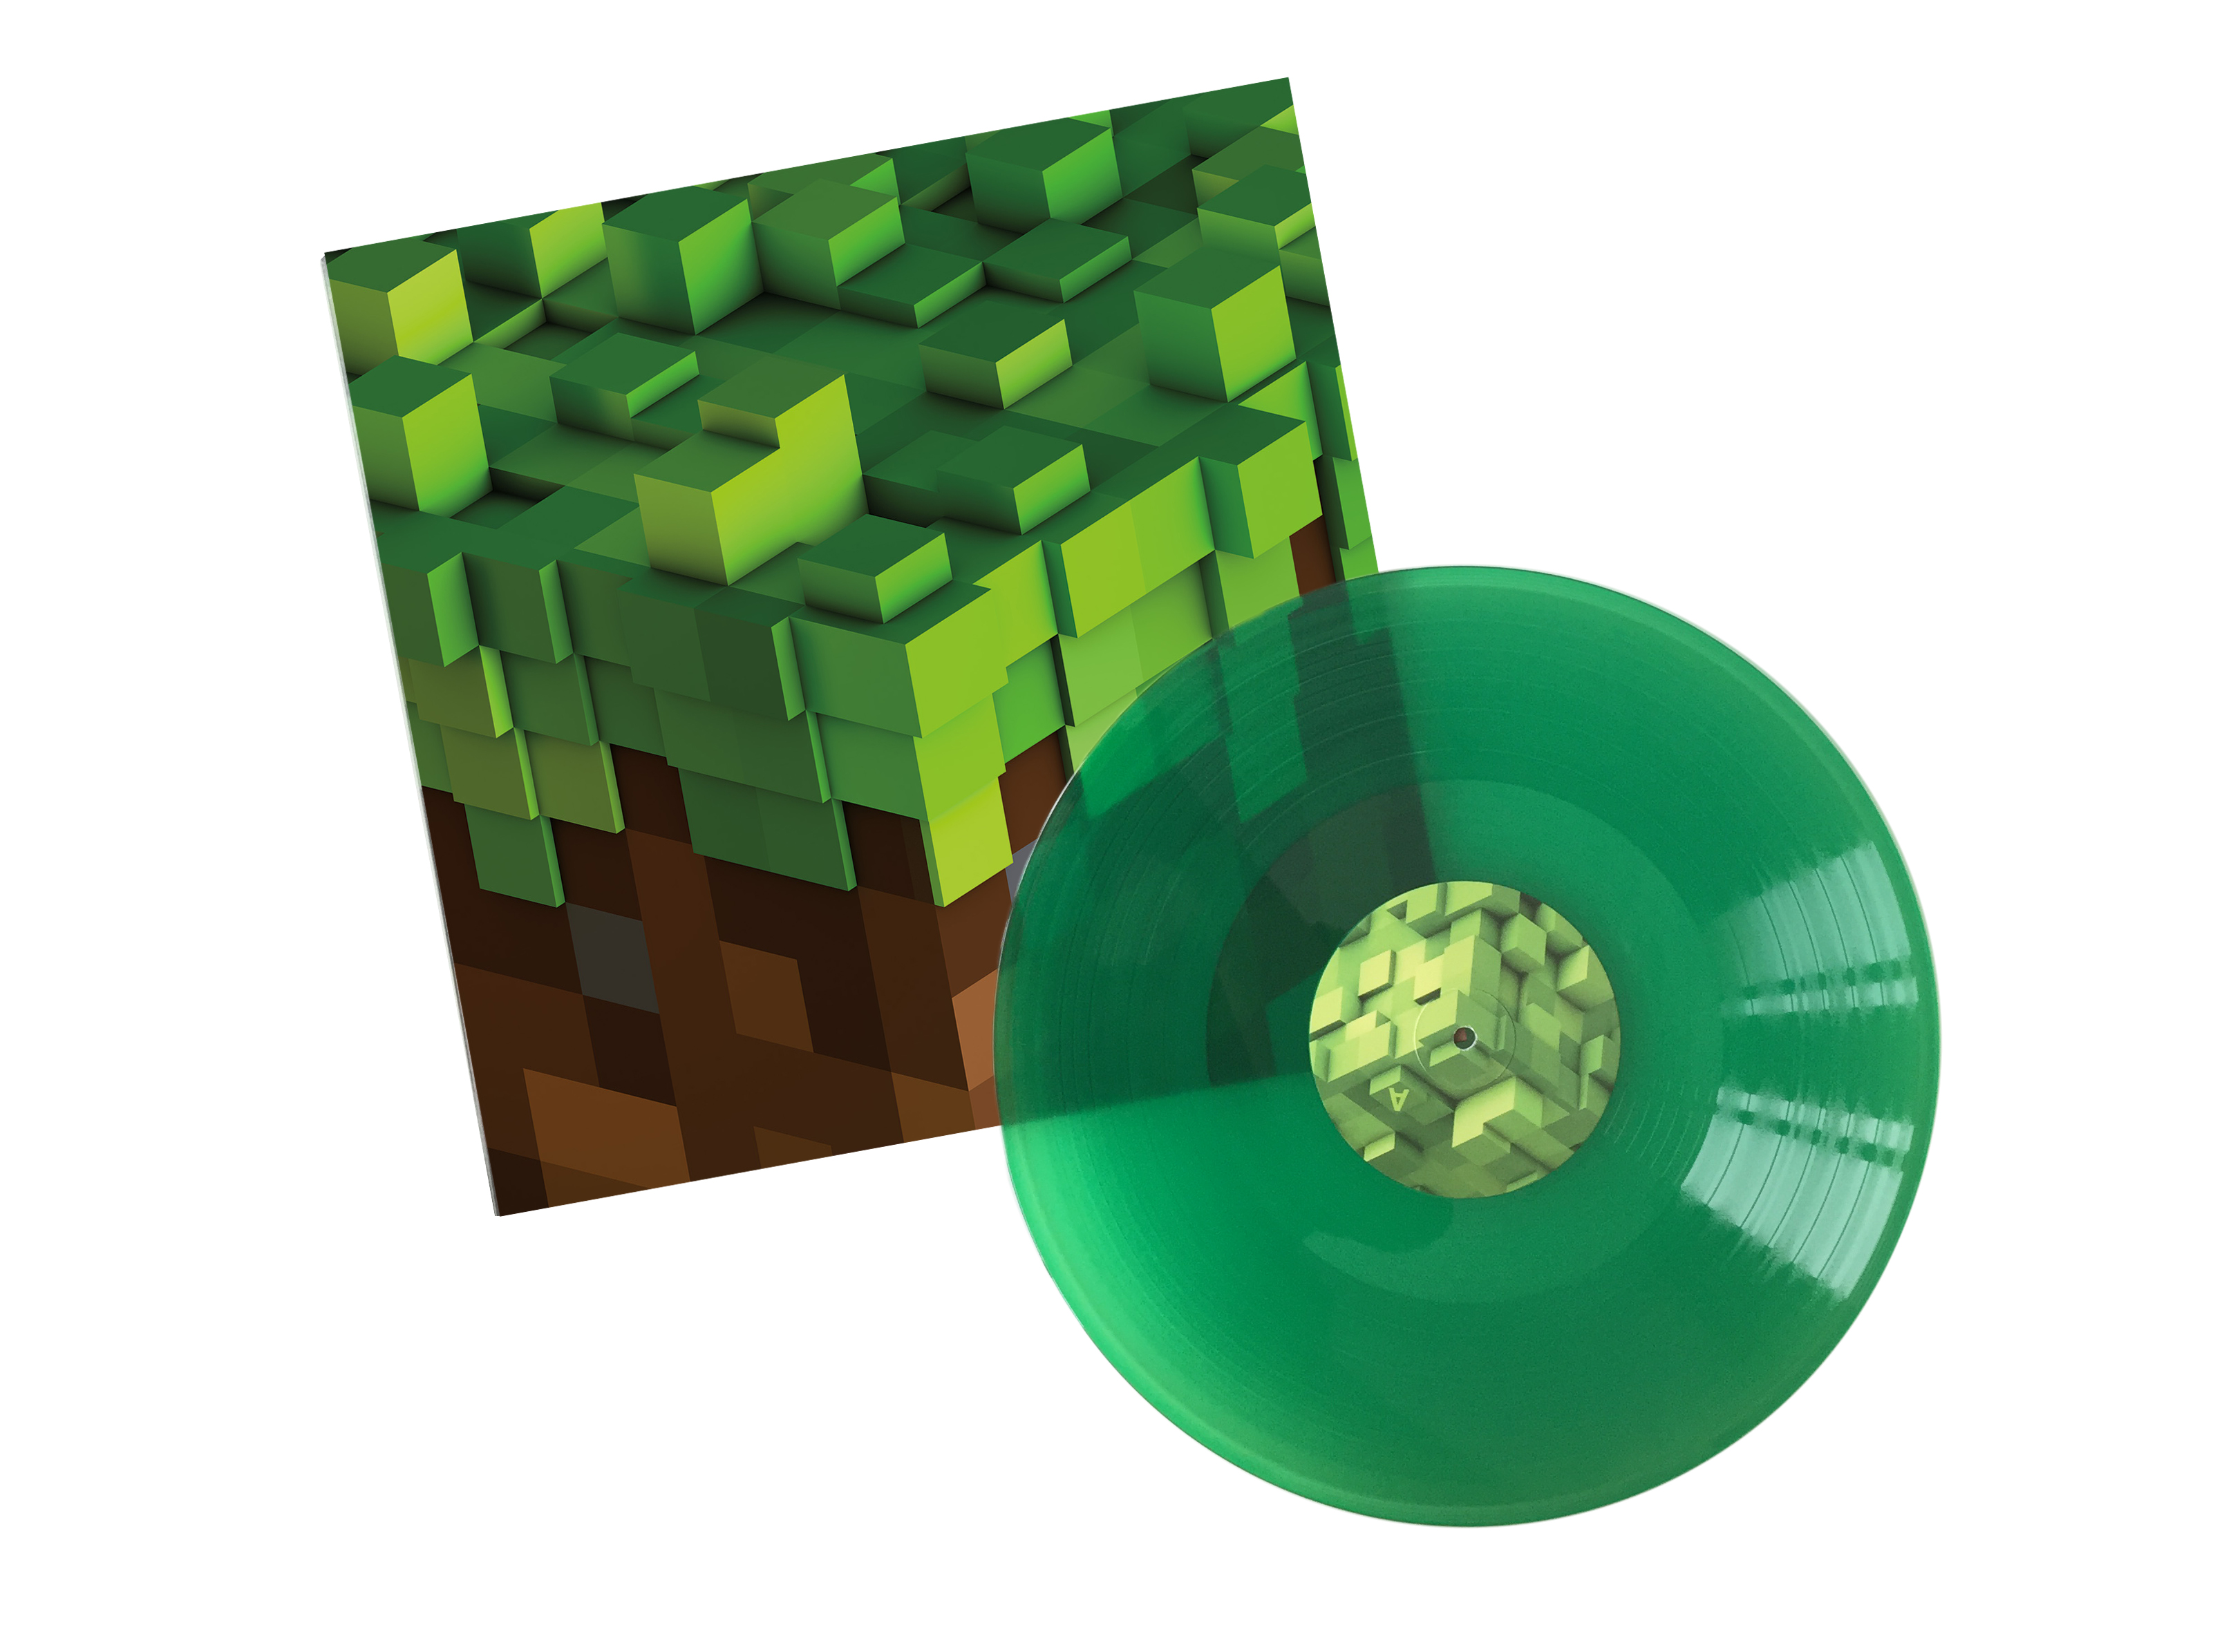 Get One Of 1 000 Special Edition Vinyl Minecraft Albums